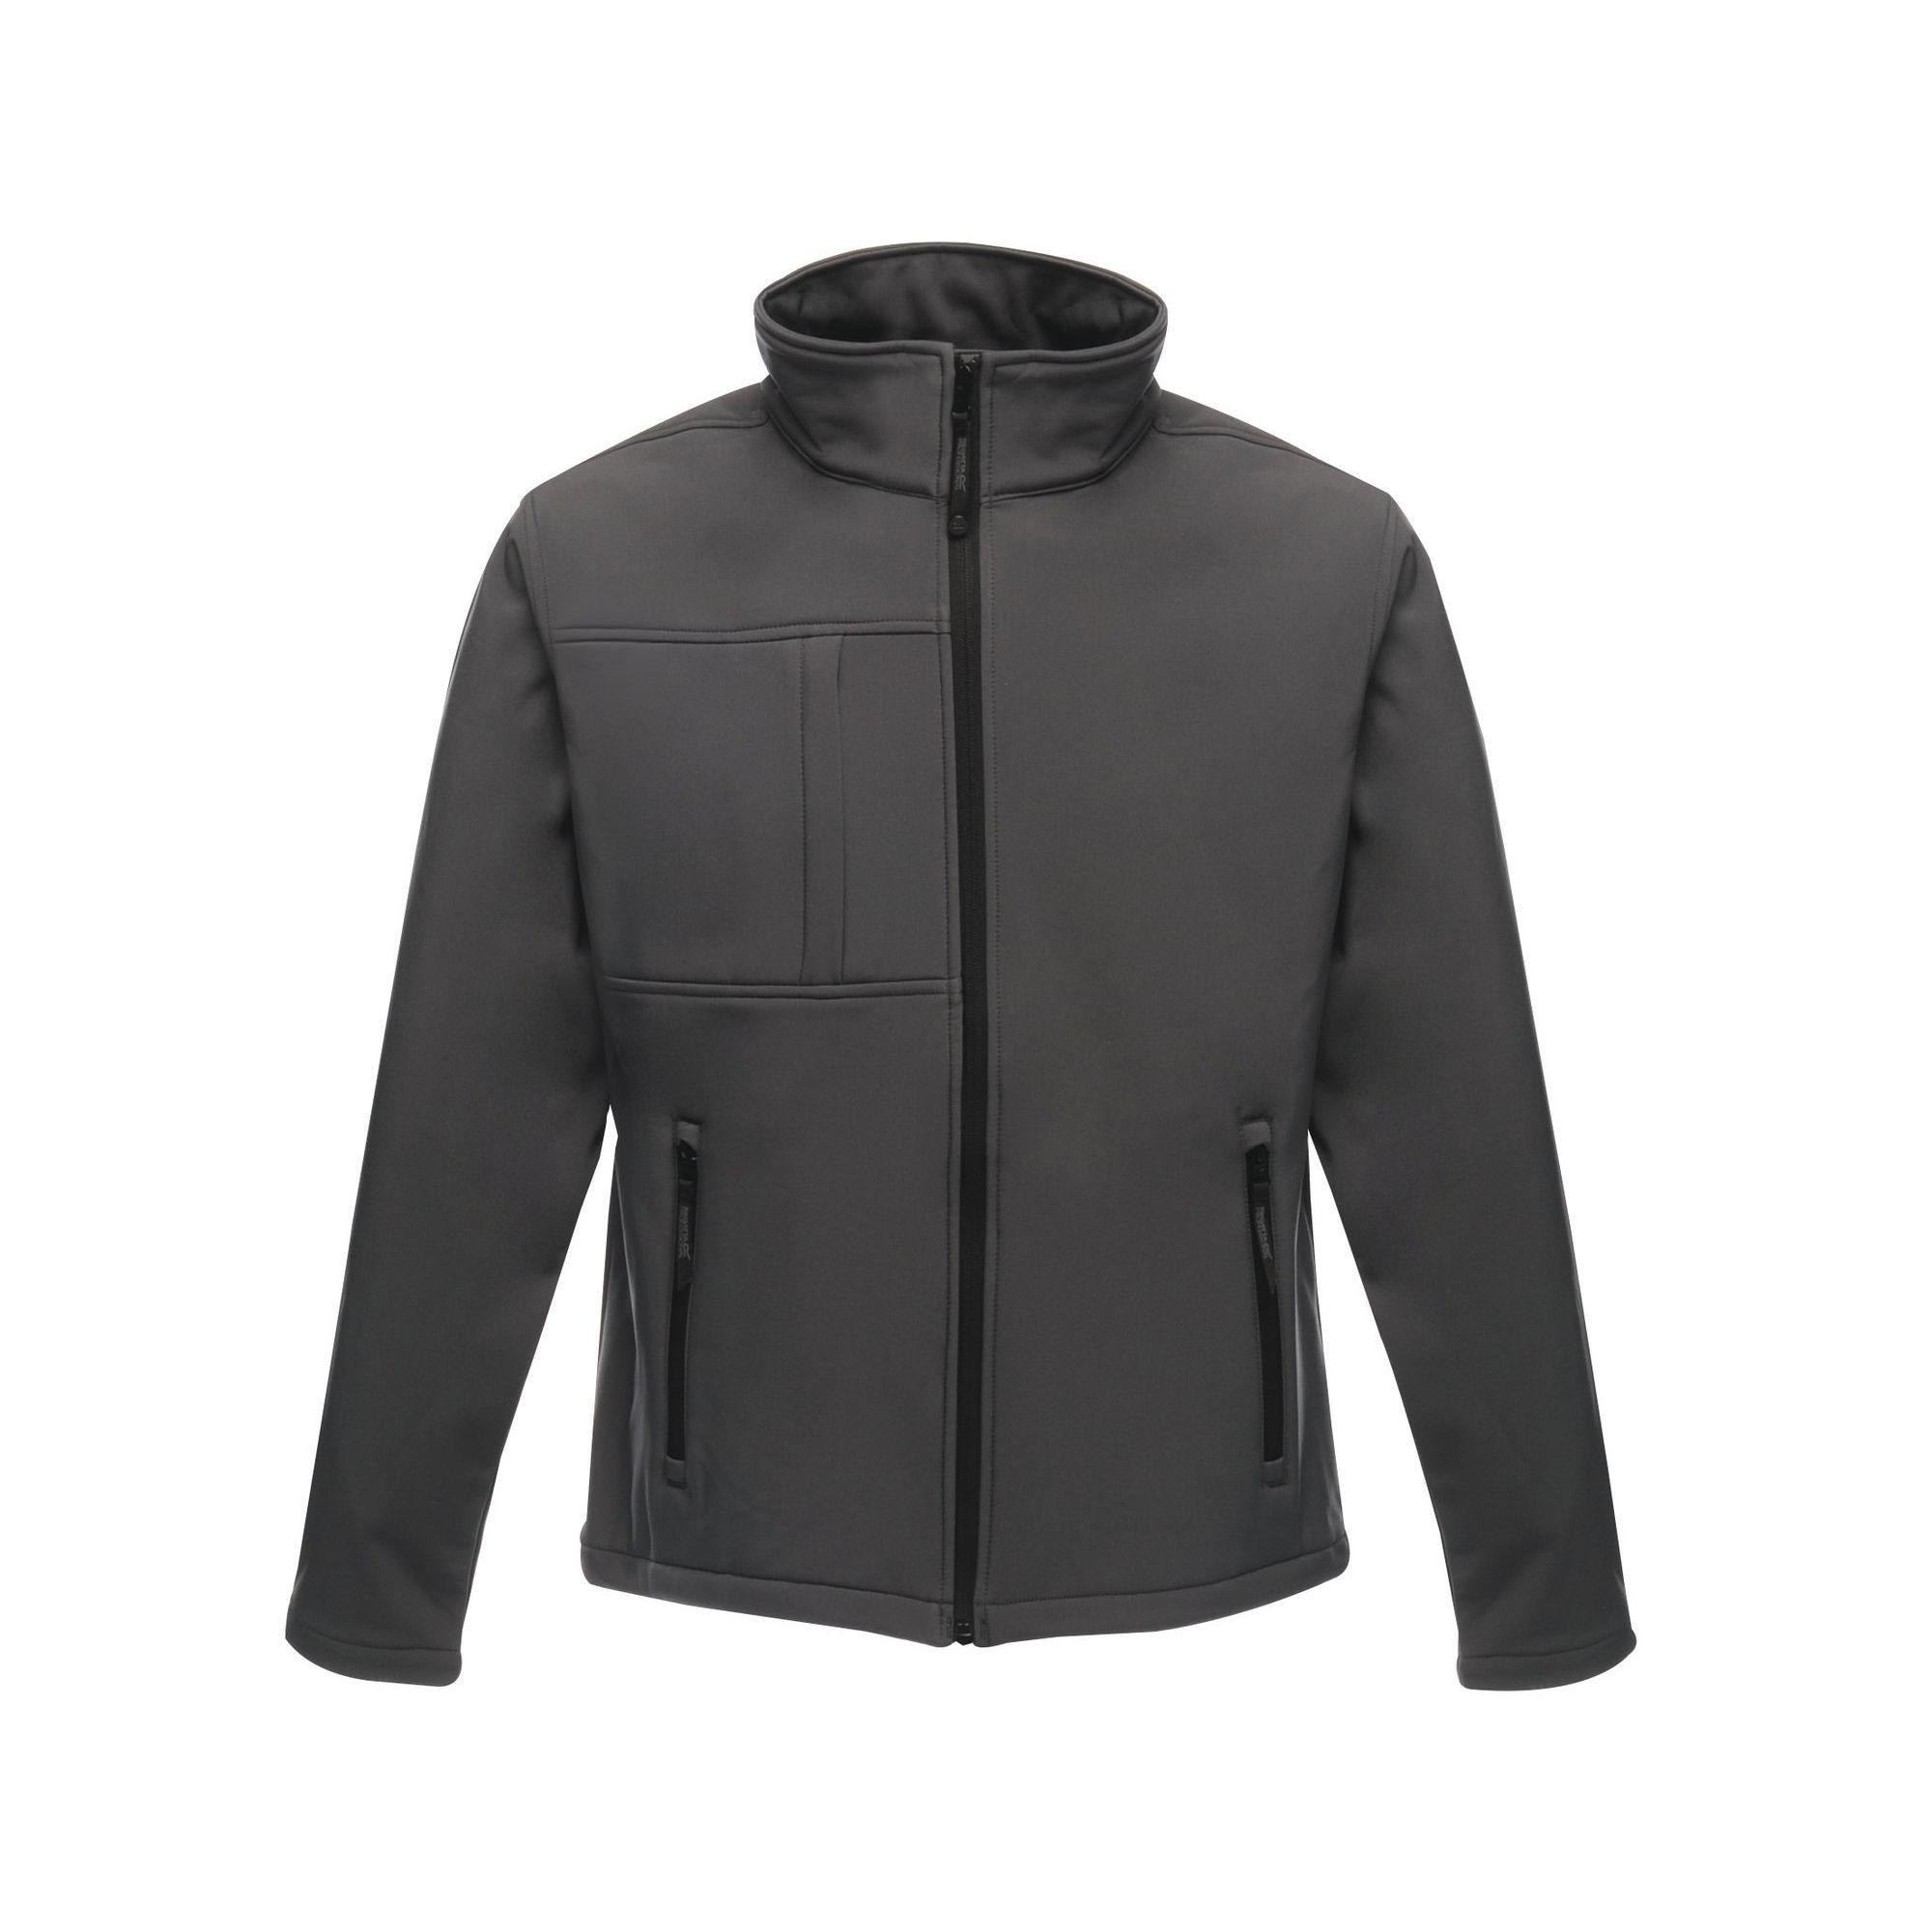 Regatta Professional Mens Octagon II Waterproof Softshell Jacket